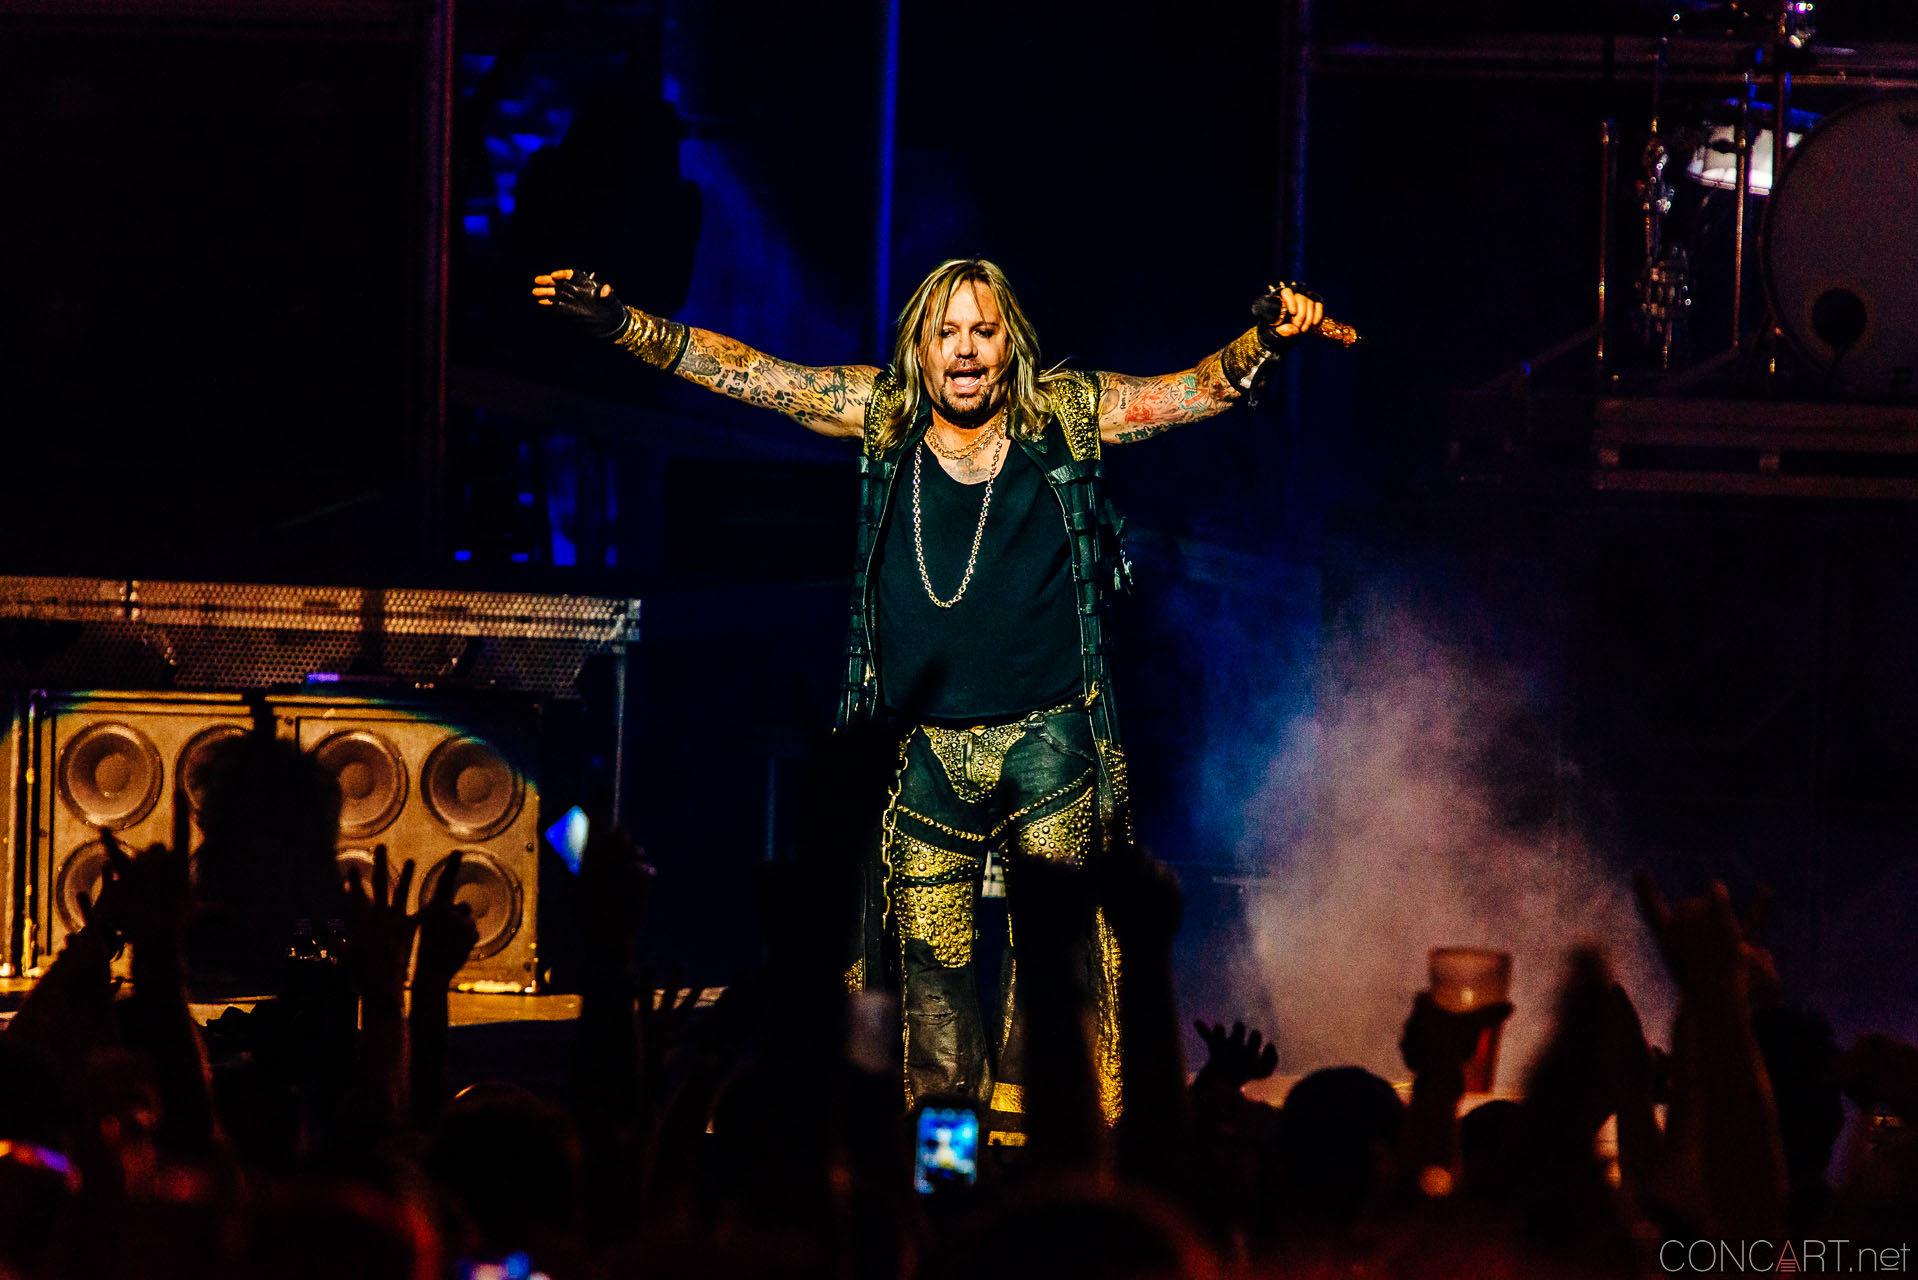 Mötley Crüe photo by Sean Molin 1